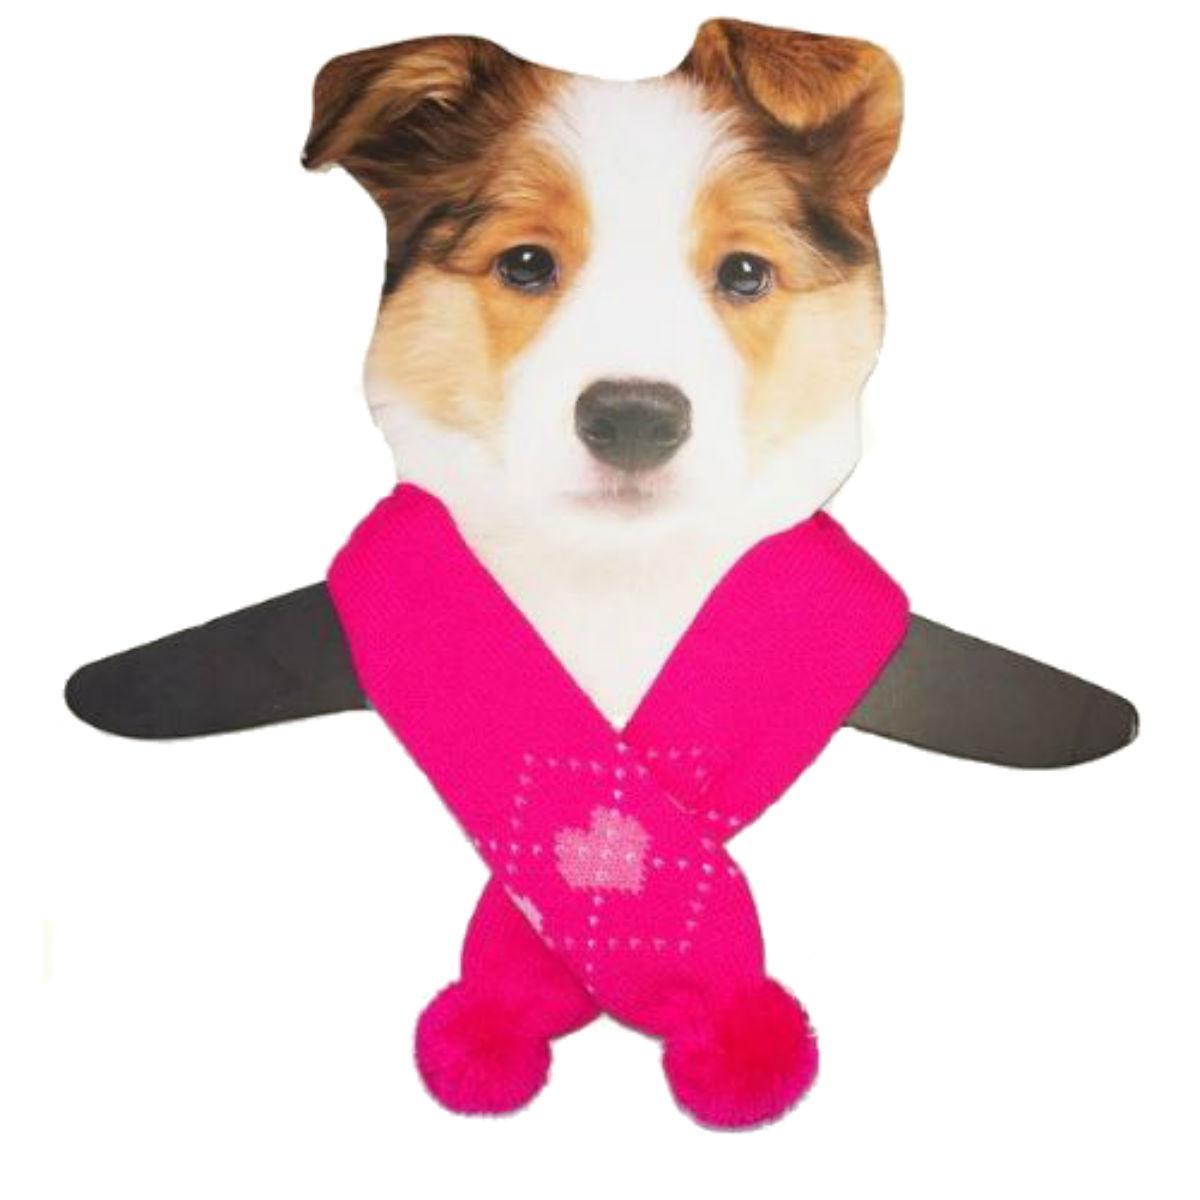 Dallas Dogs Sassy Dog Scarf - Pink Hearts